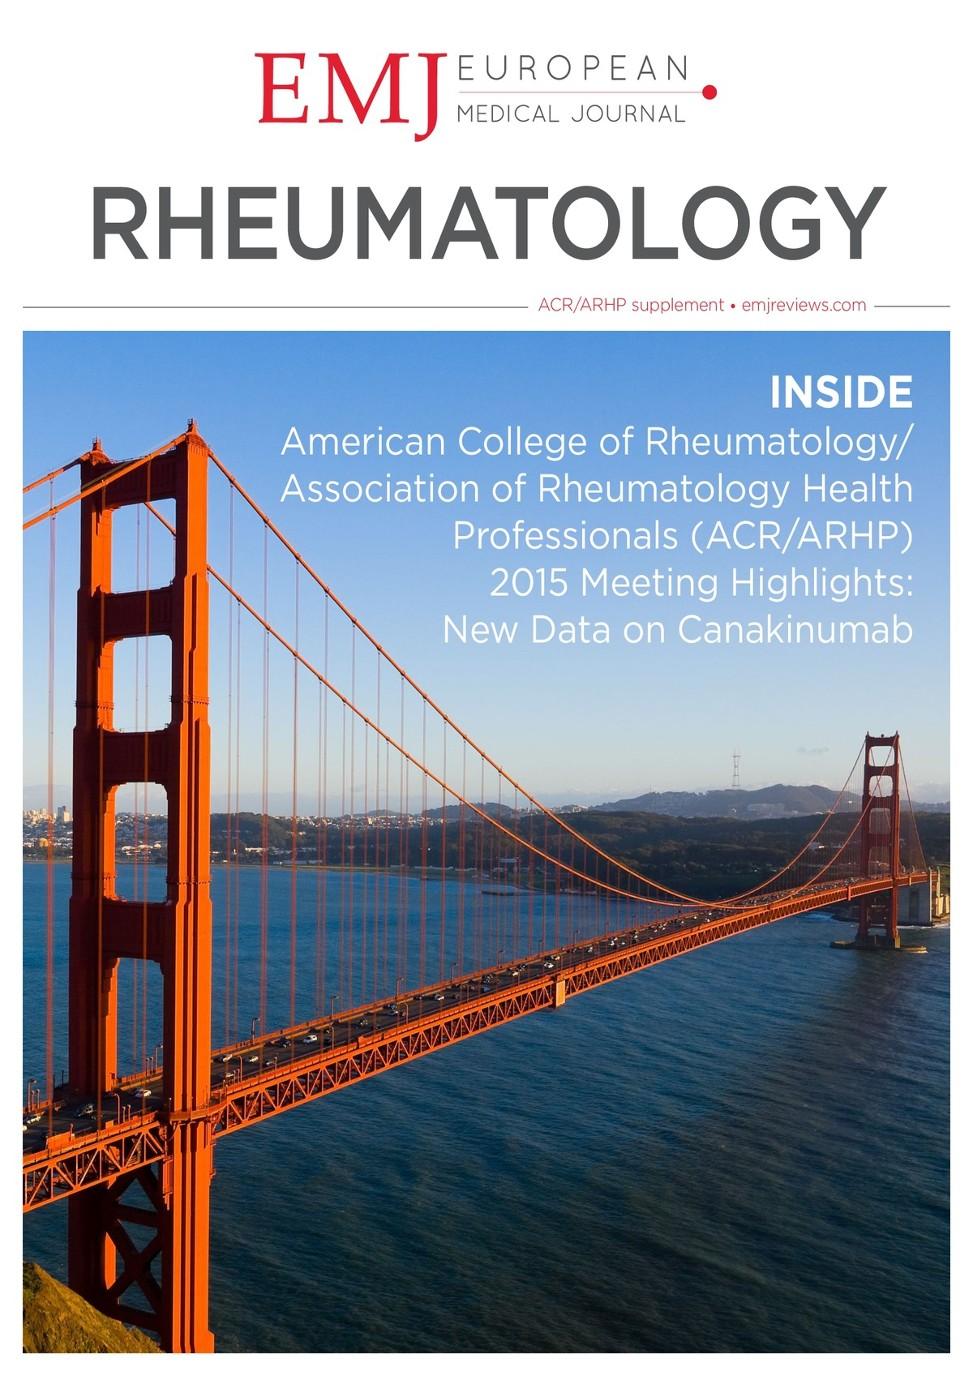 EMJ Rheumatology 3 [Suppl 5] 2016 - European Medical Journal